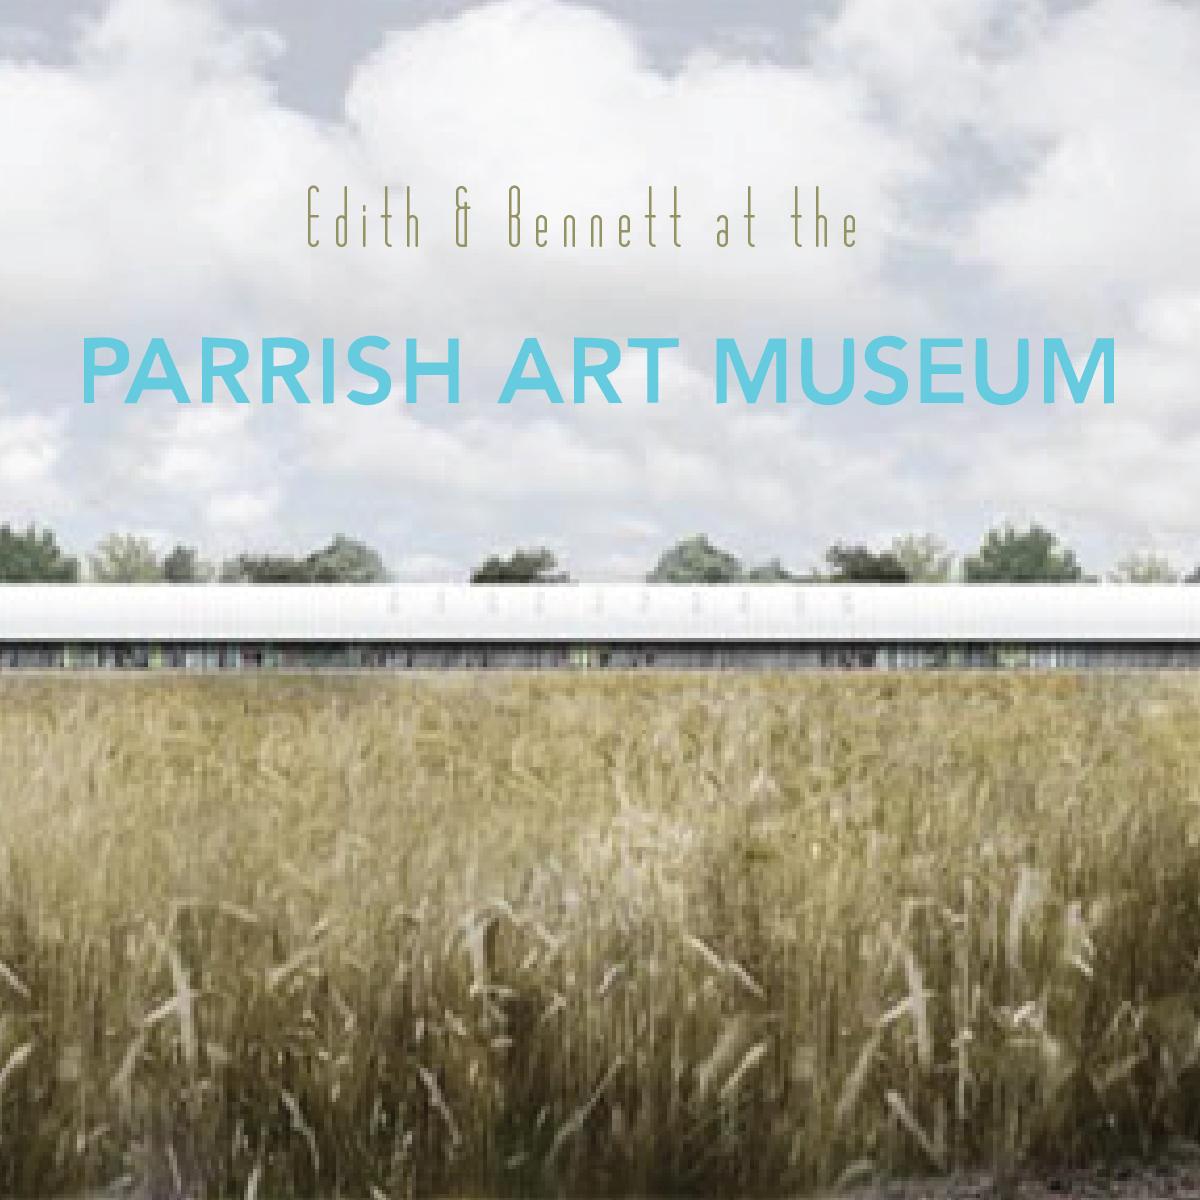 Edith-Bennett-at-the-Parrish-Art-Museum-01-01.jpg